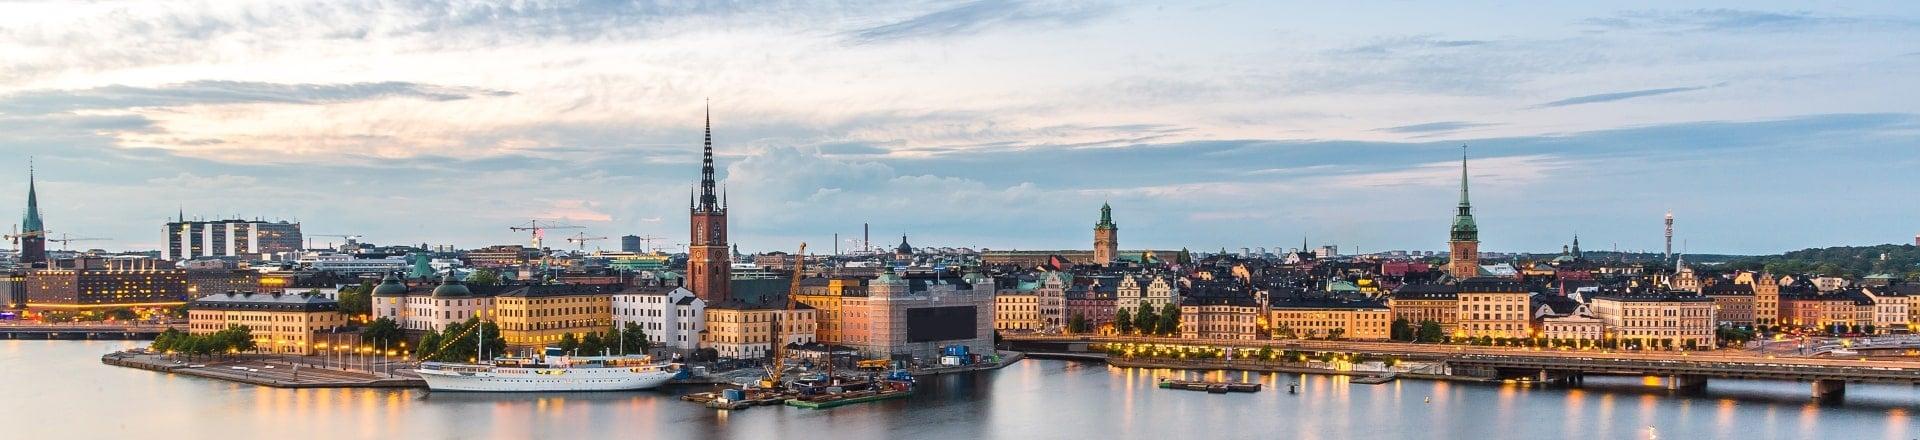 Stockholm's Gamla Stan